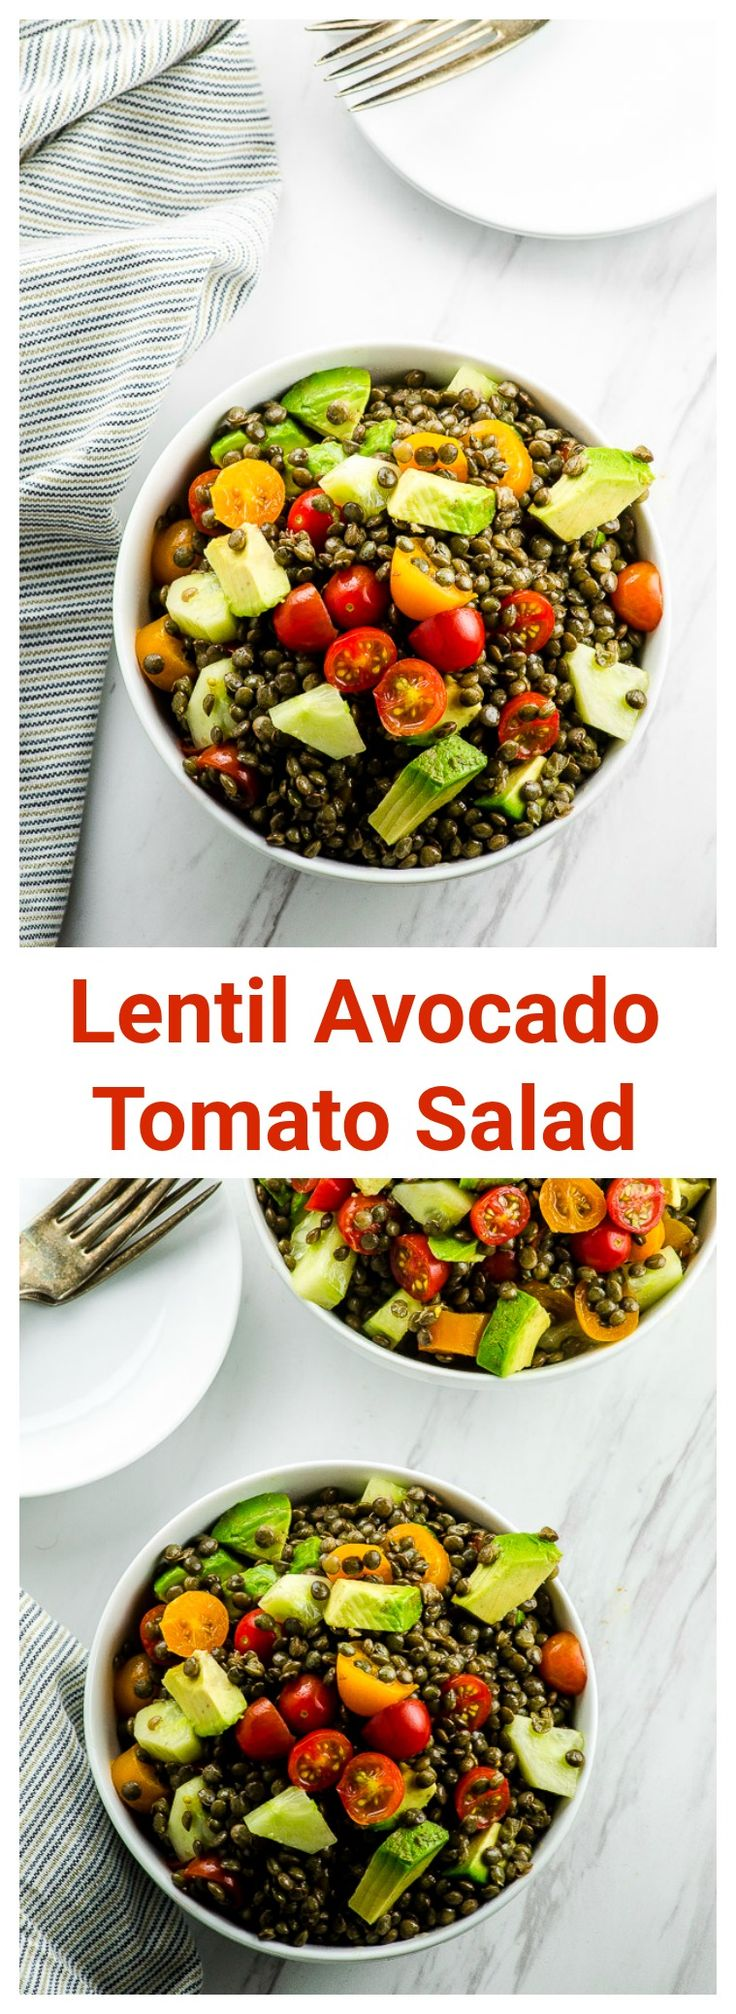 Lentil Avocado and Tomato Salad. A fresh, colorful…